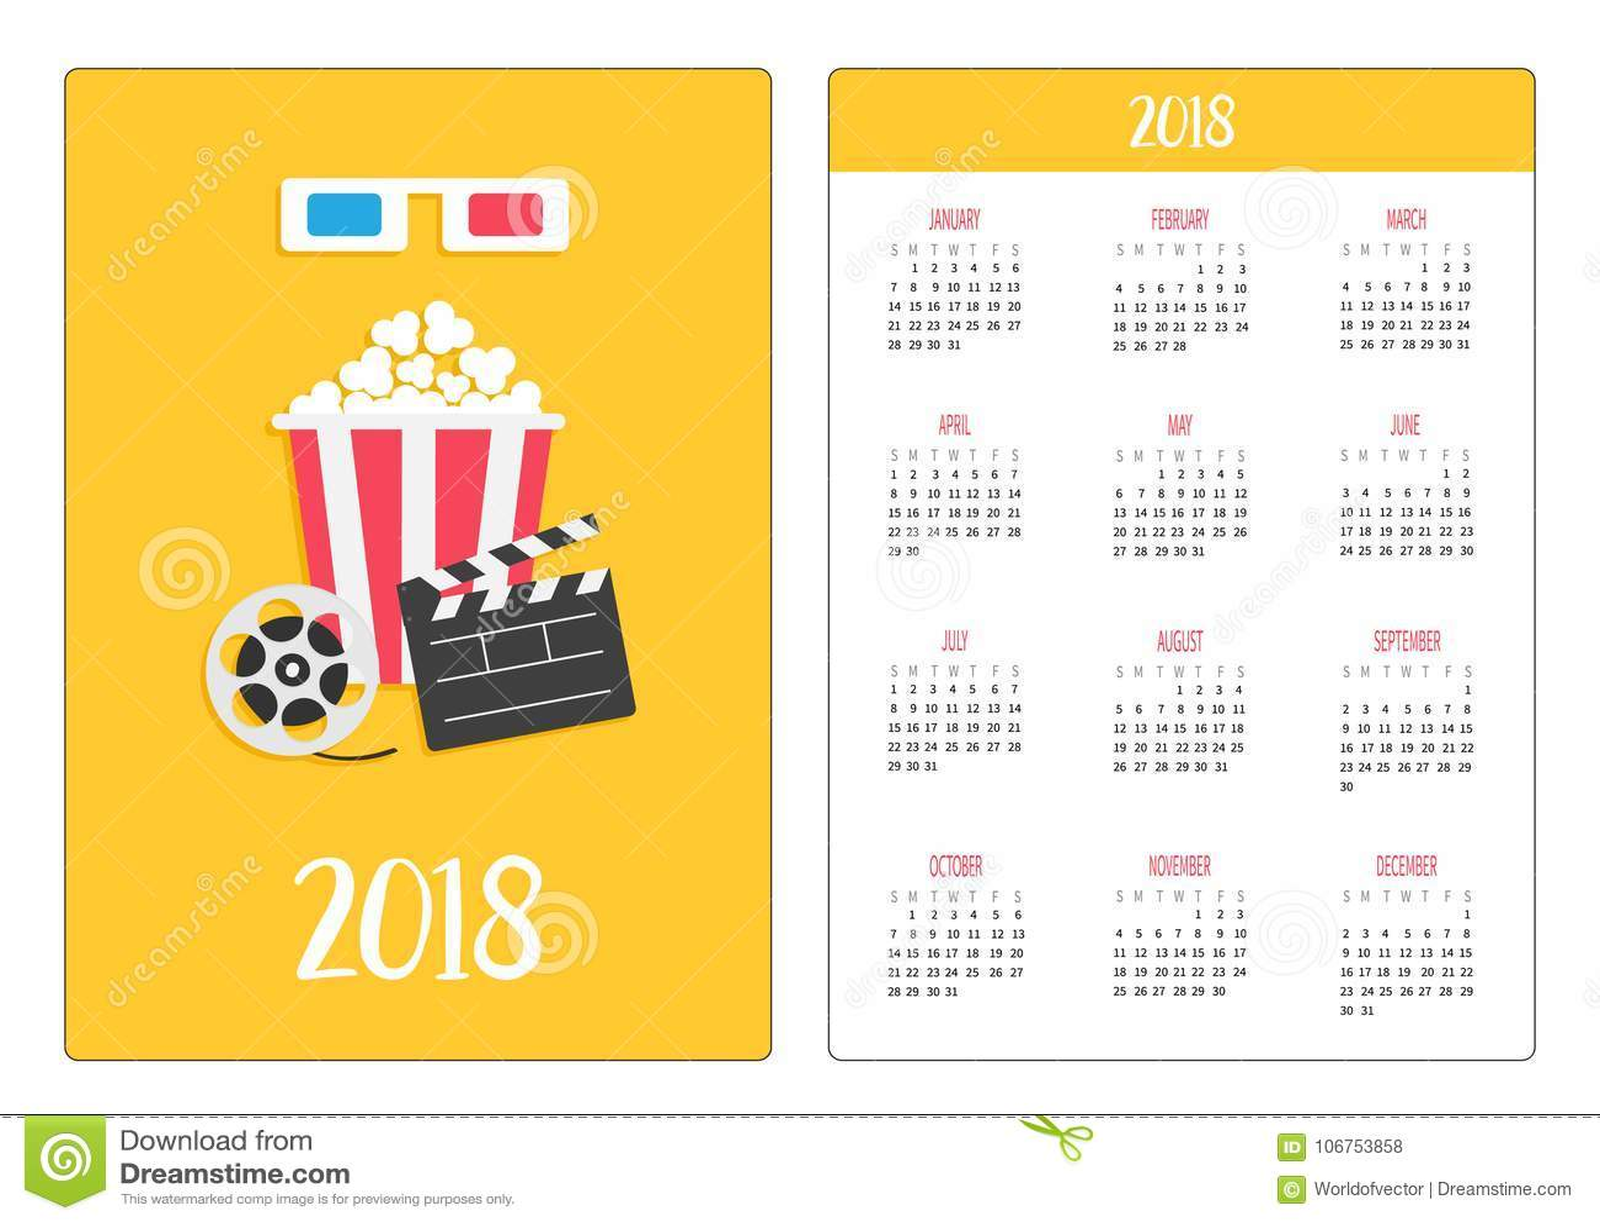 Pocket calendar 2018 year. Week starts Sunday. 3D paper red blue glasses. Open clapper board Movie reel Popcorn Cinema Movie icon